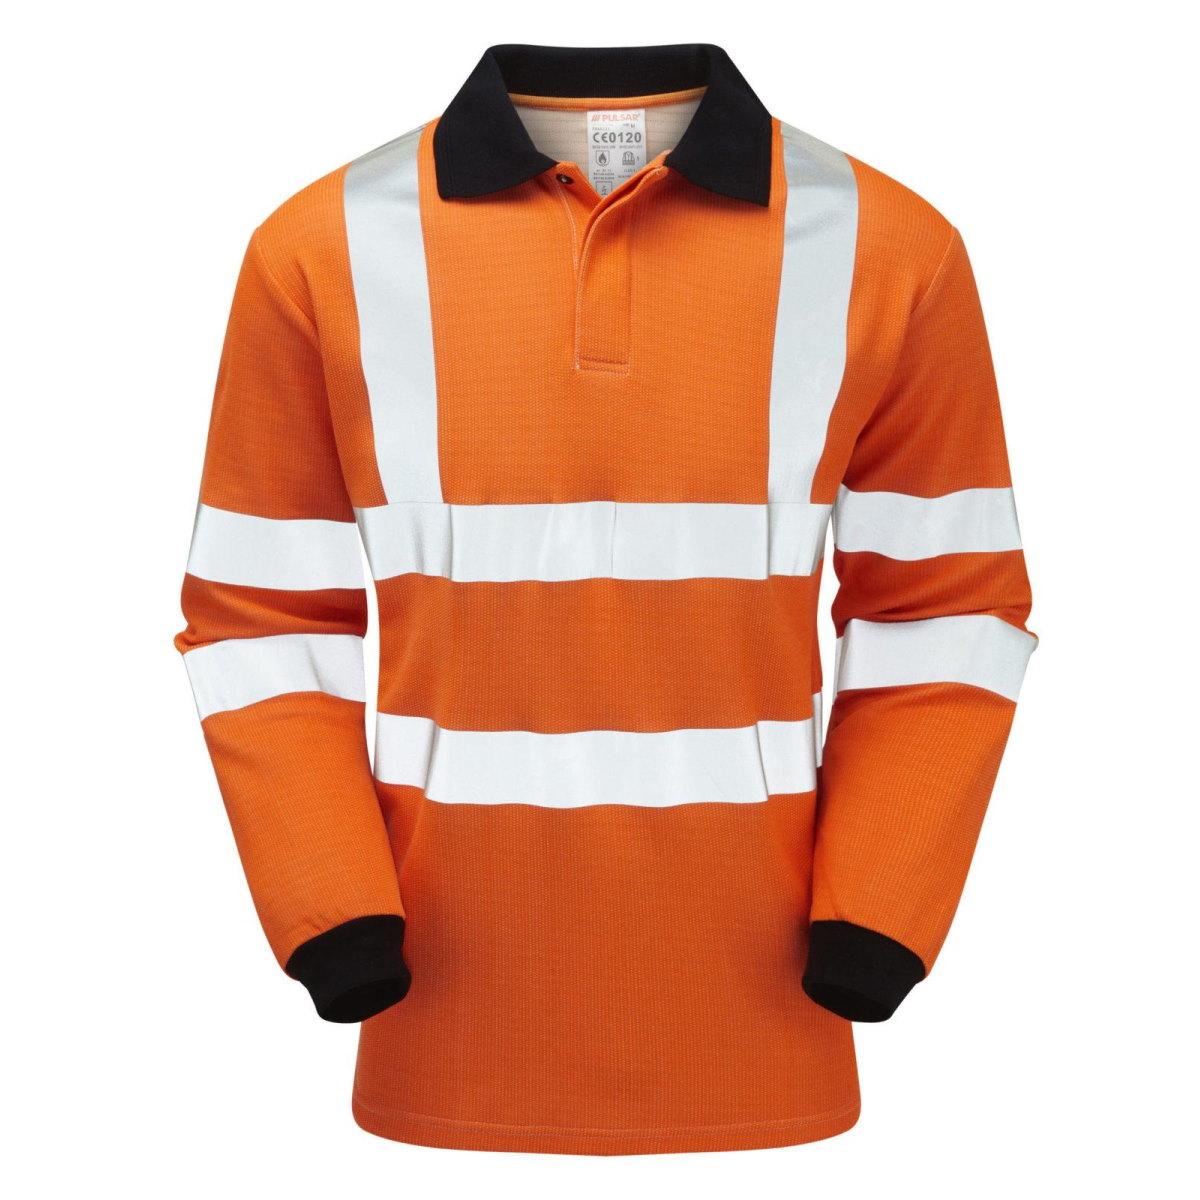 PULSAR Hi-Vis Orange Flame Resistant ARC Polo